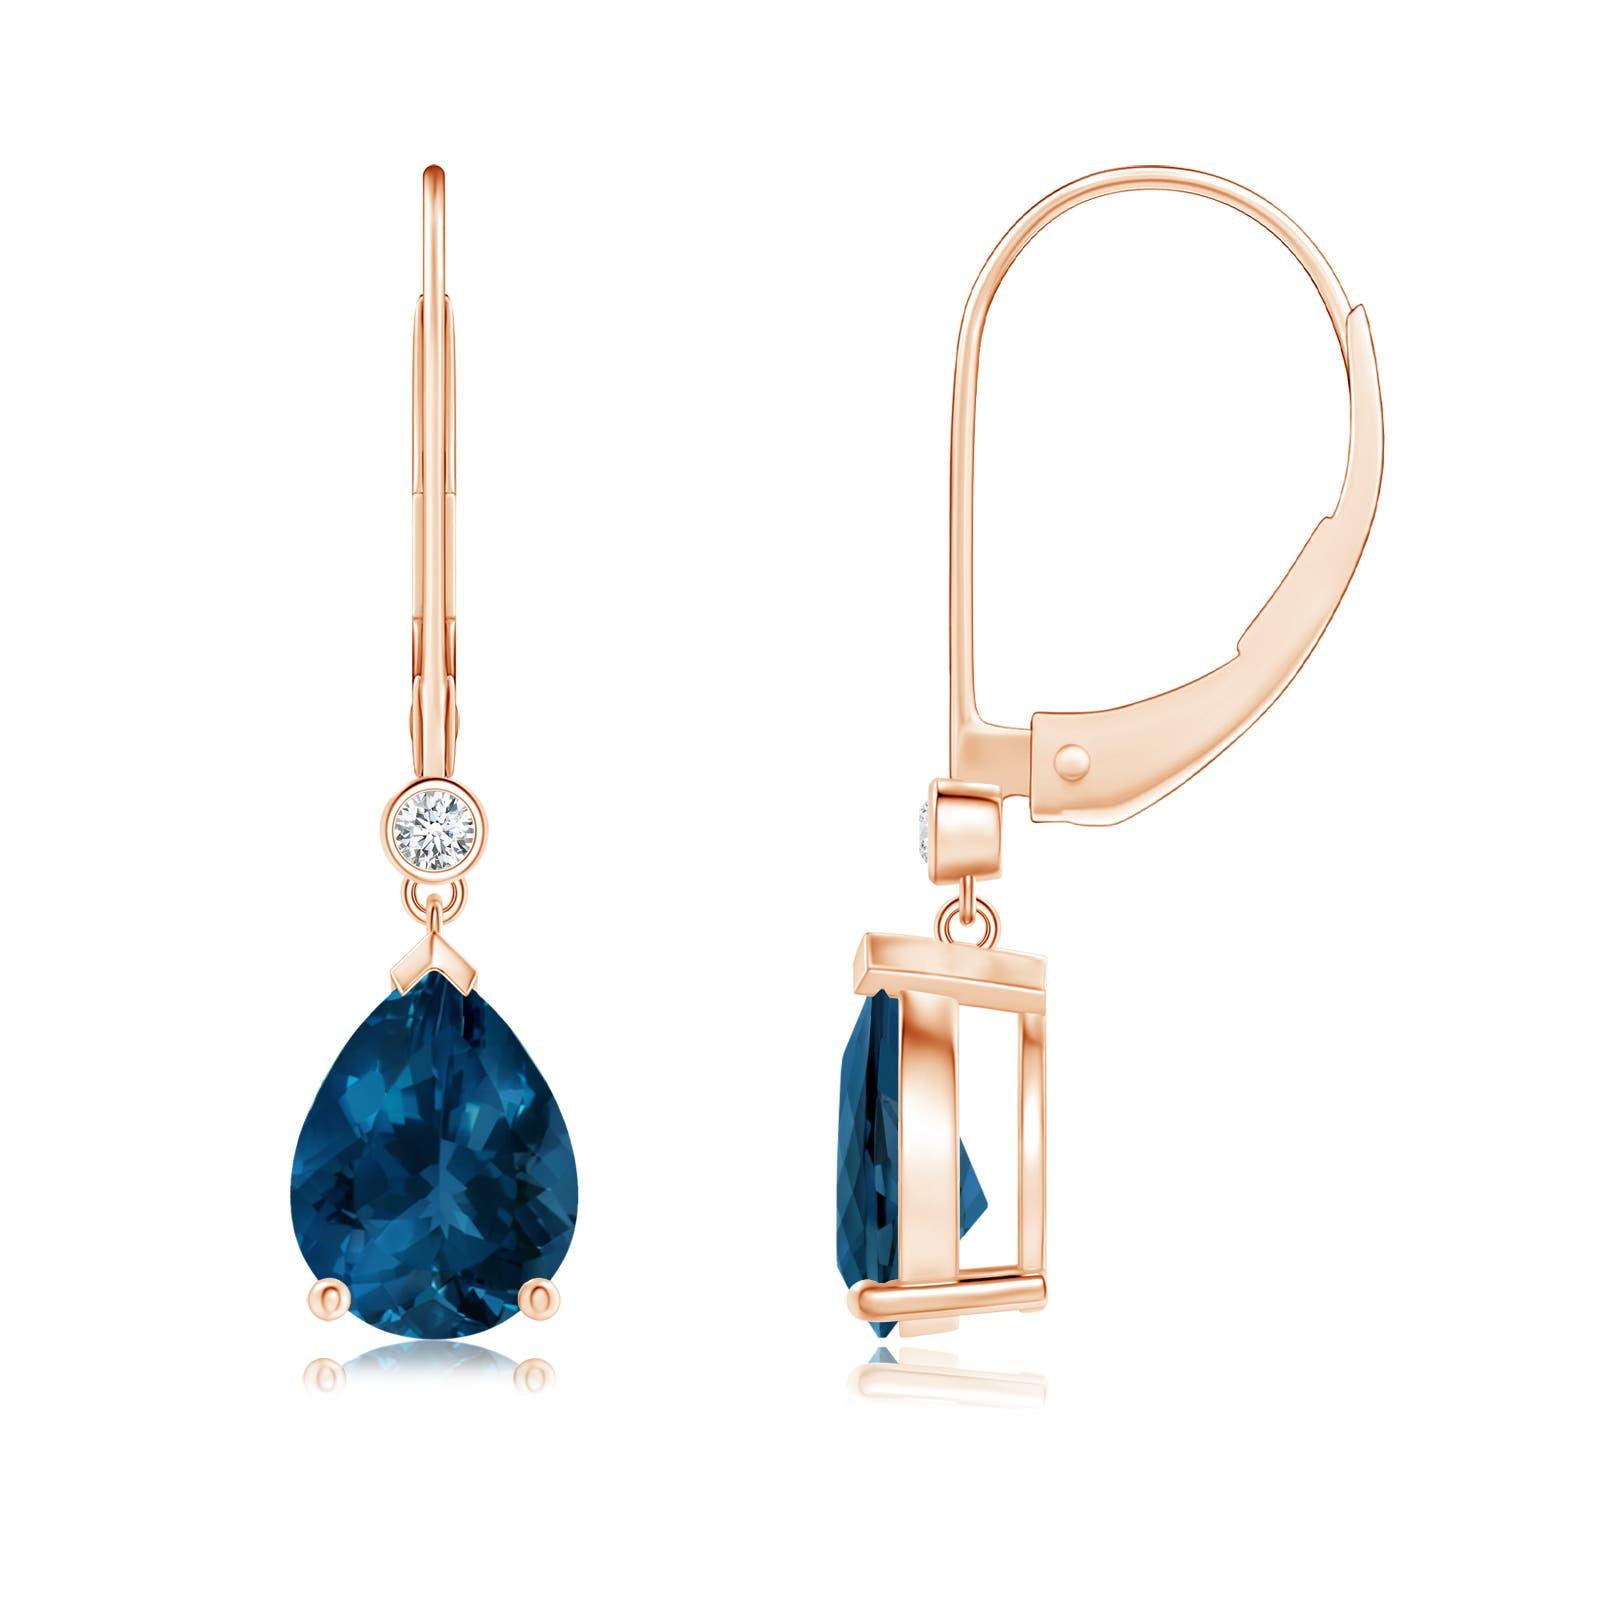 Pear-Shaped London Blue Topaz Leverback Drop Earrings - Angara.com